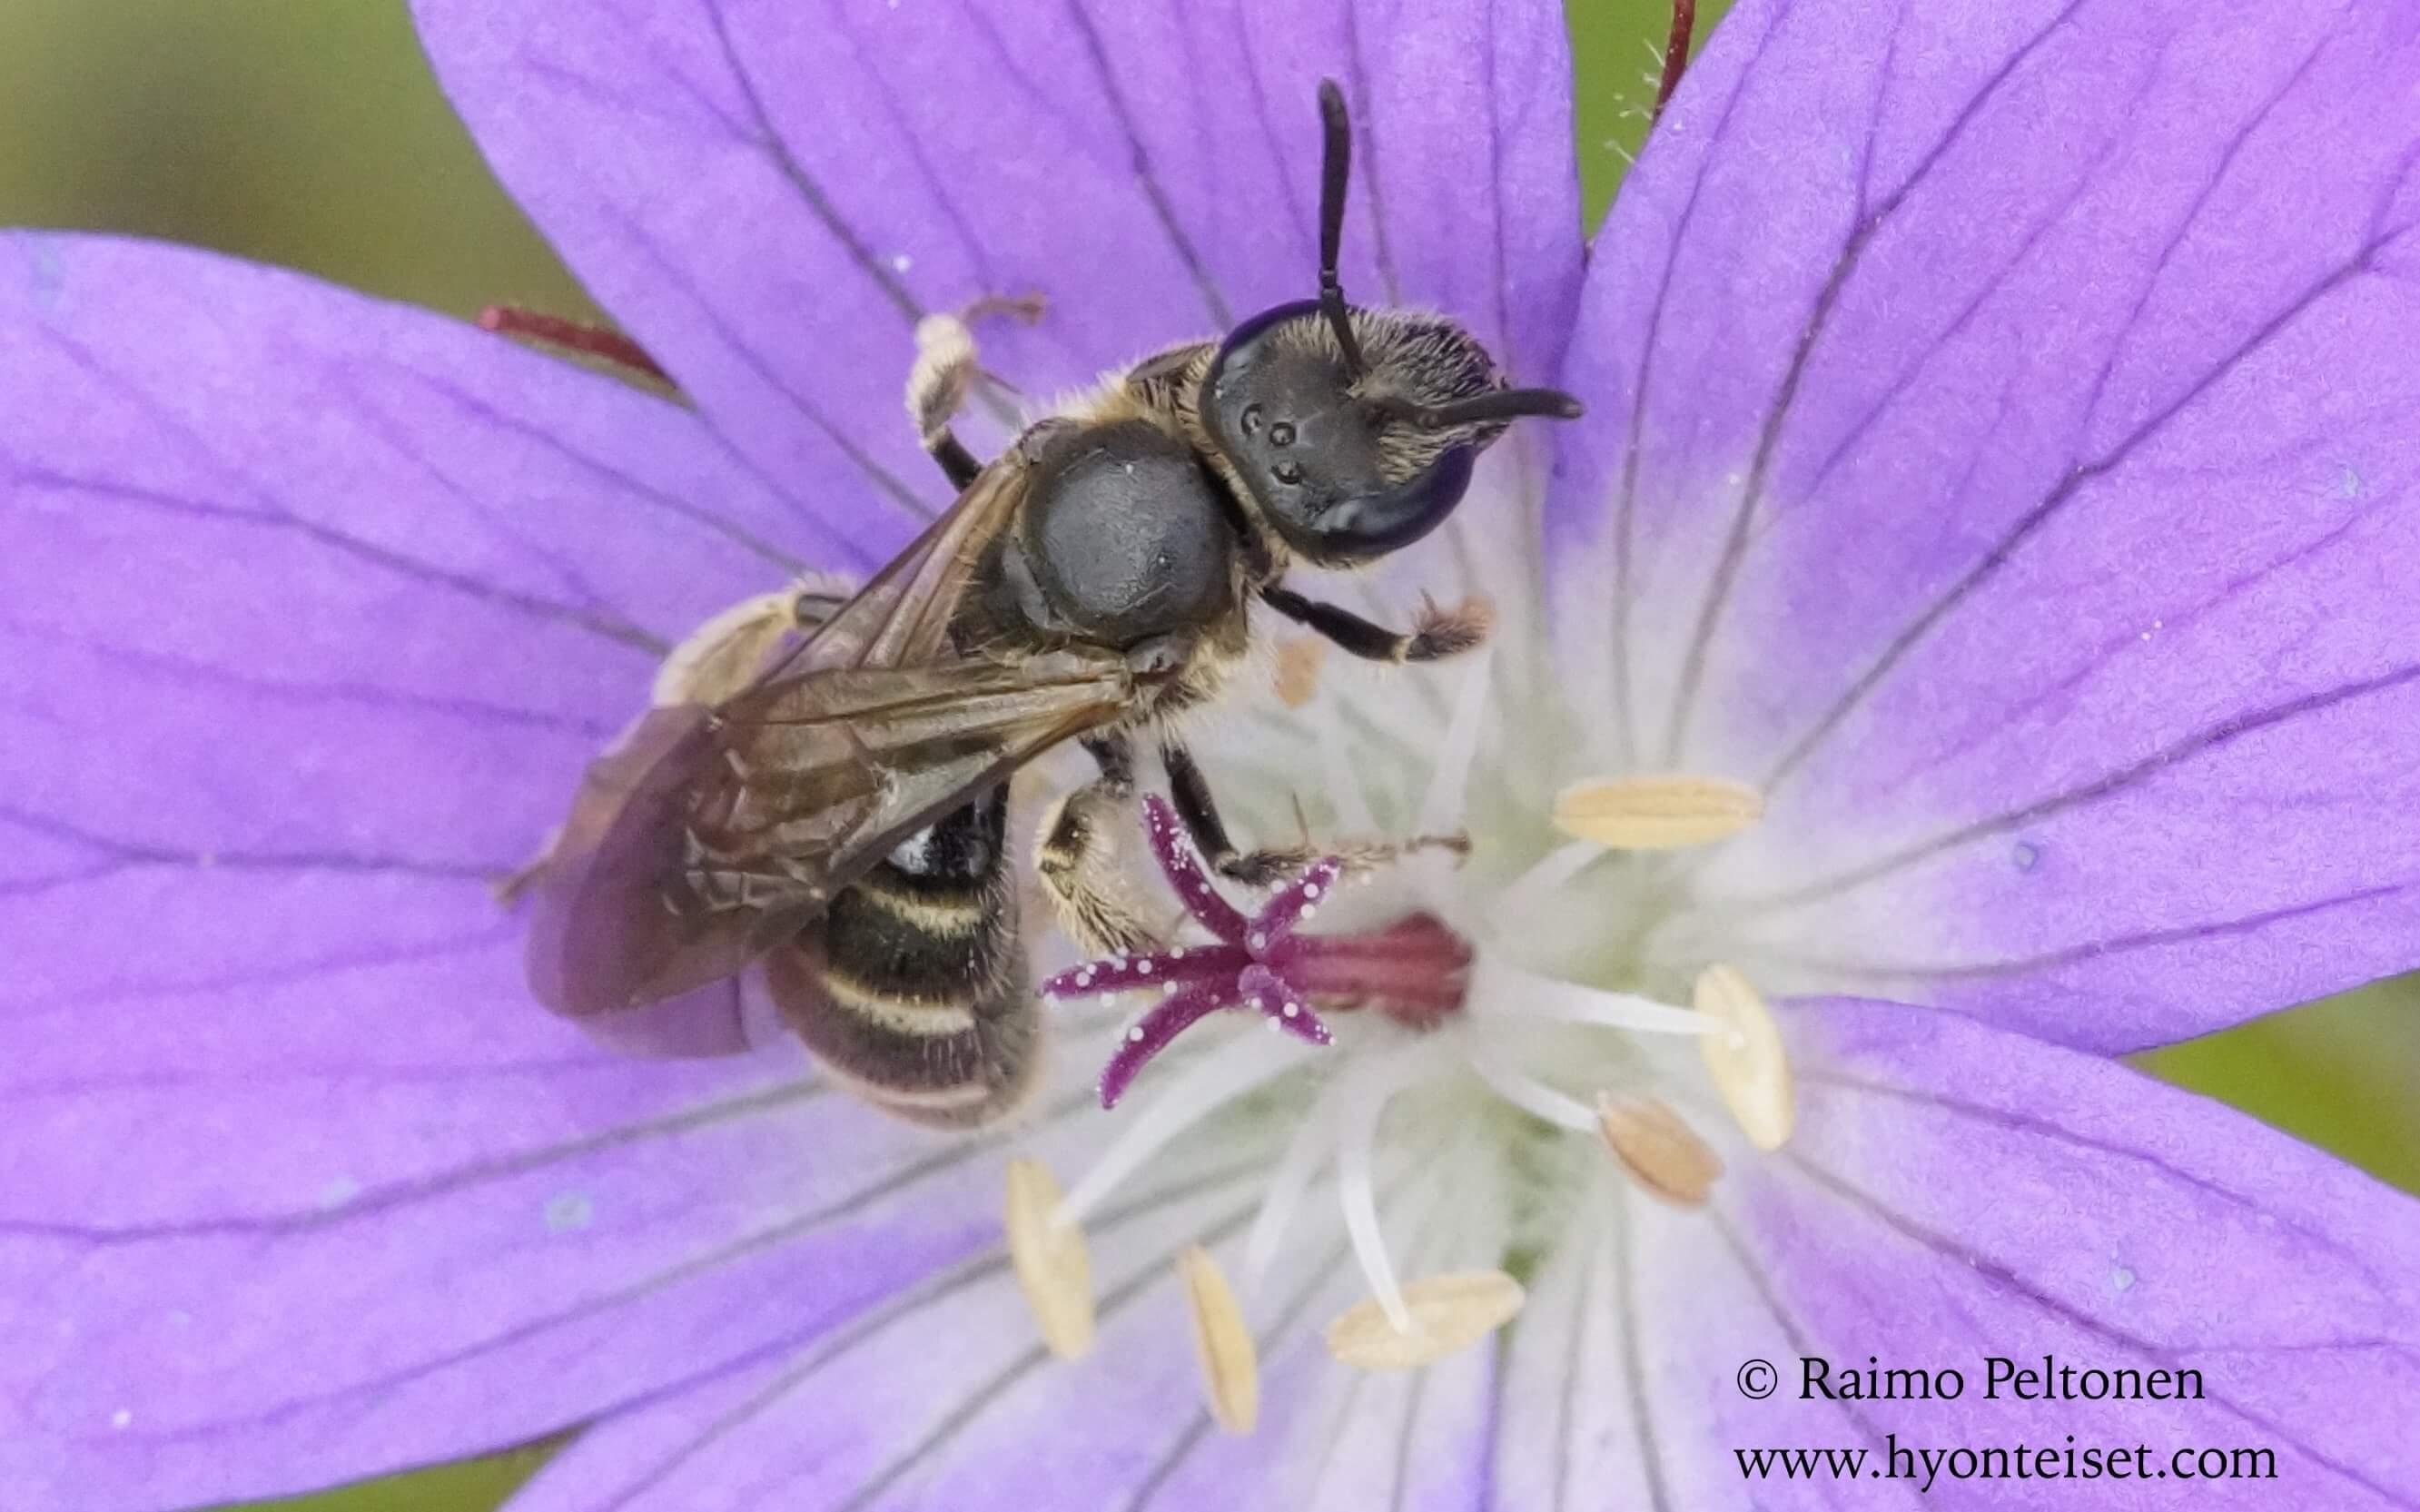 Lasioglossum albipes/fratellum (det. Juho Paukkunen)